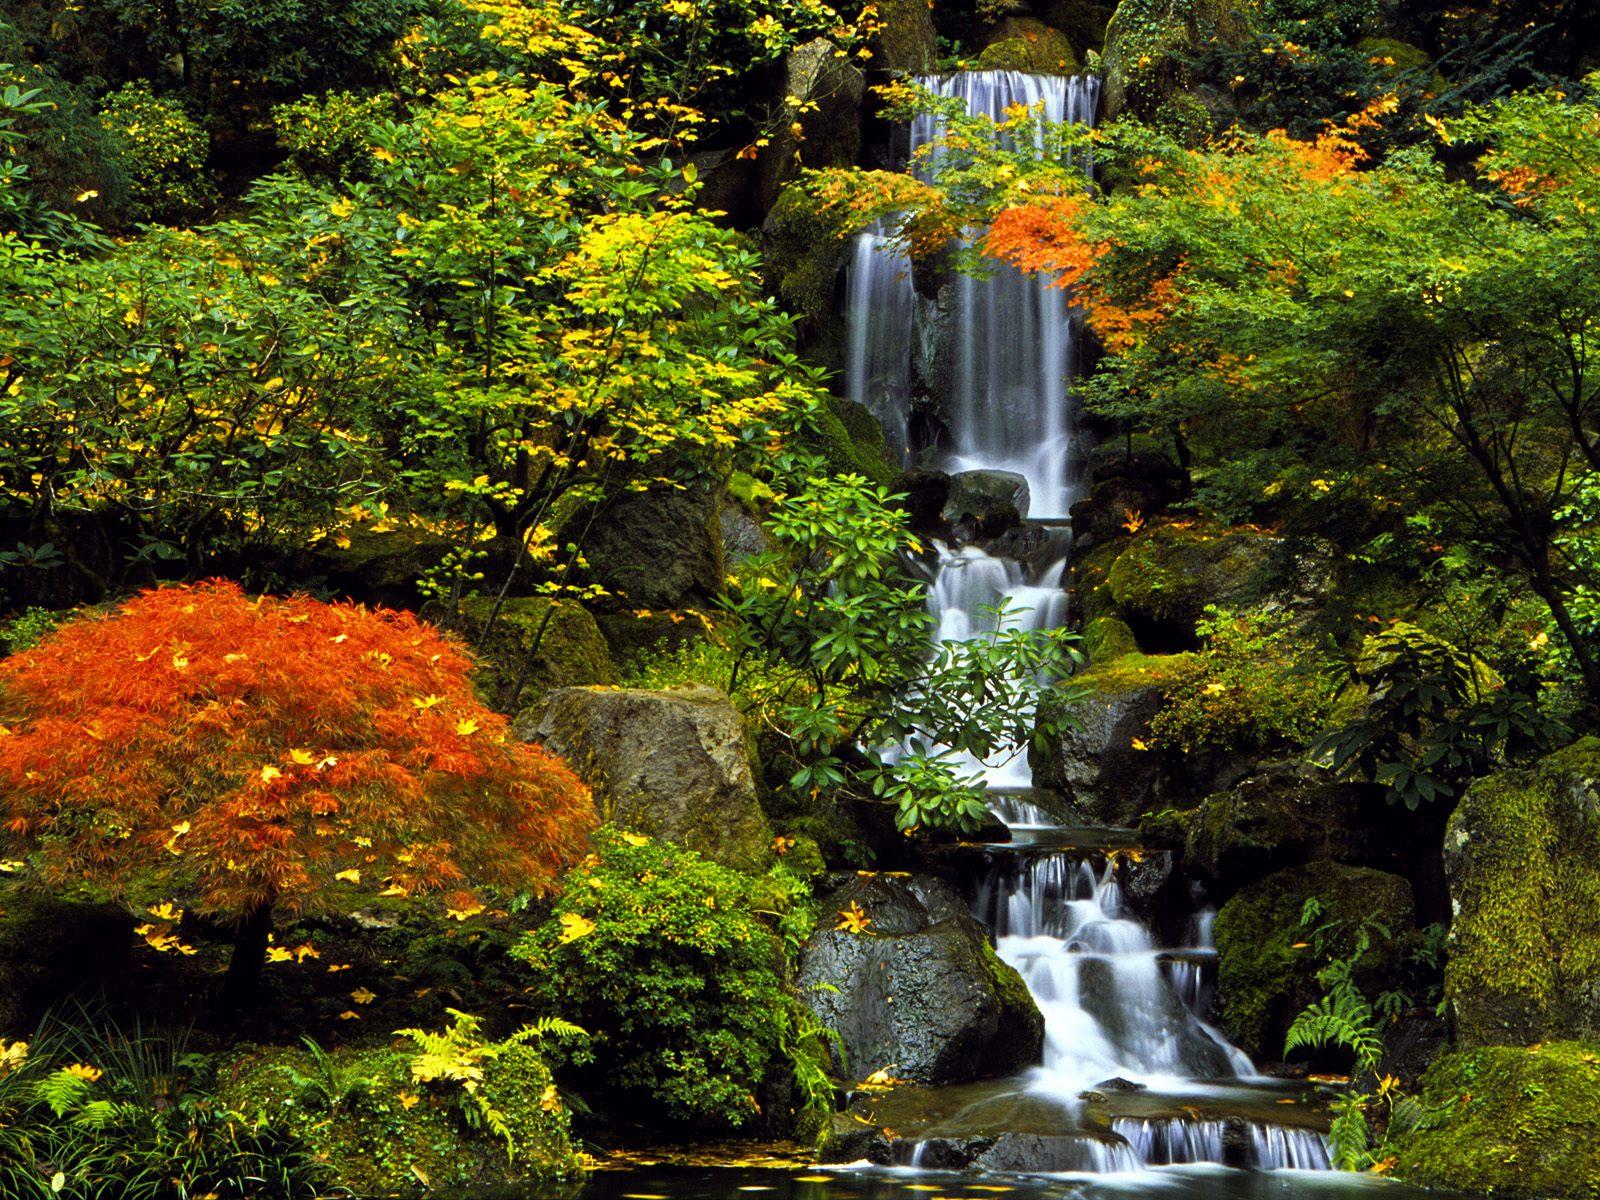 Beautiful Autumn   Wallpaper 16326 1600x1200